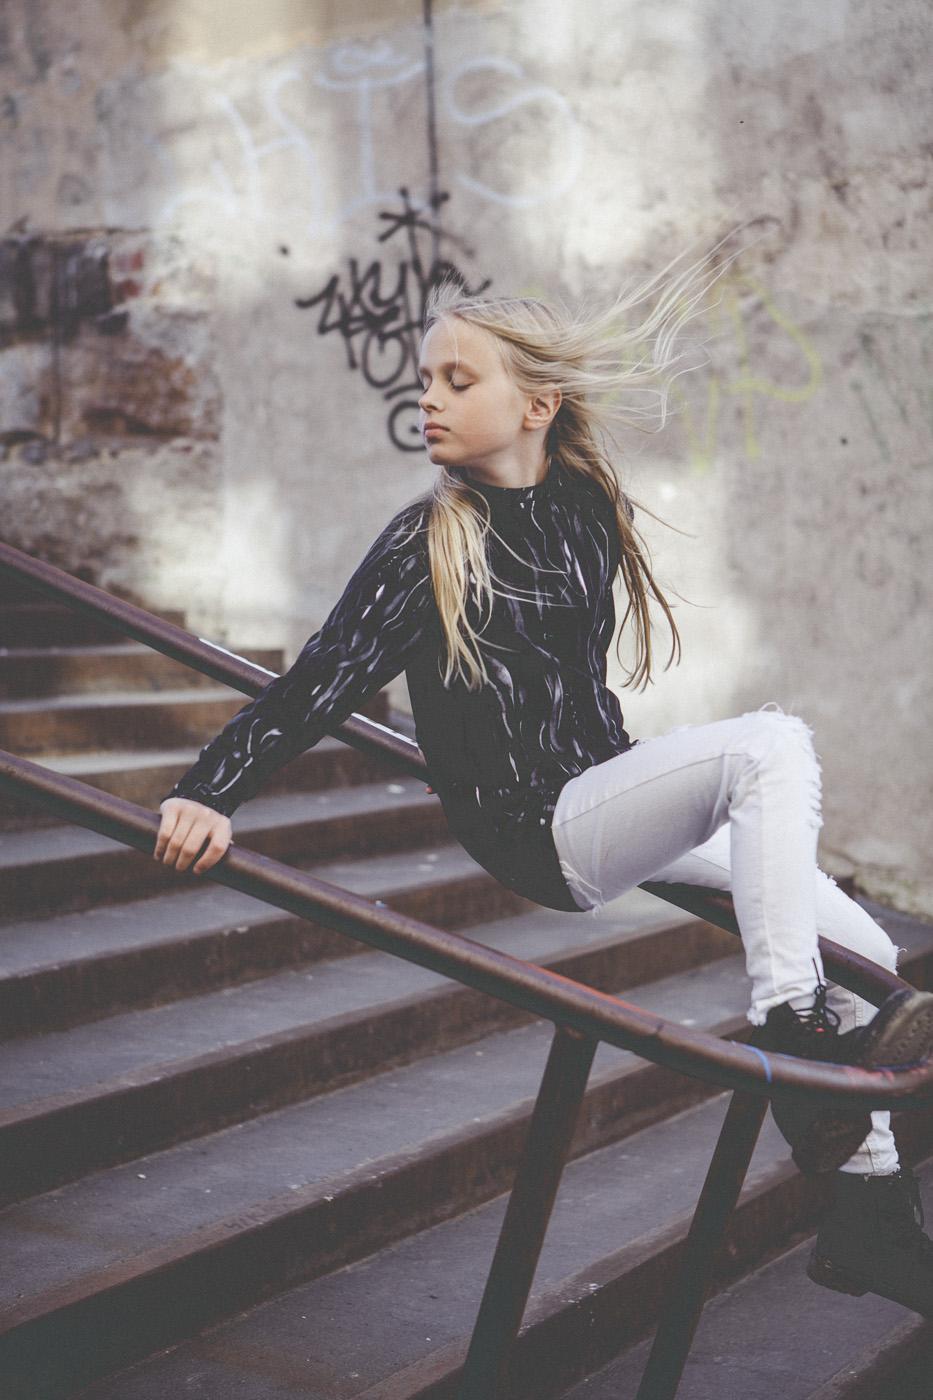 Photo by Sini Gustafsson / Vimma